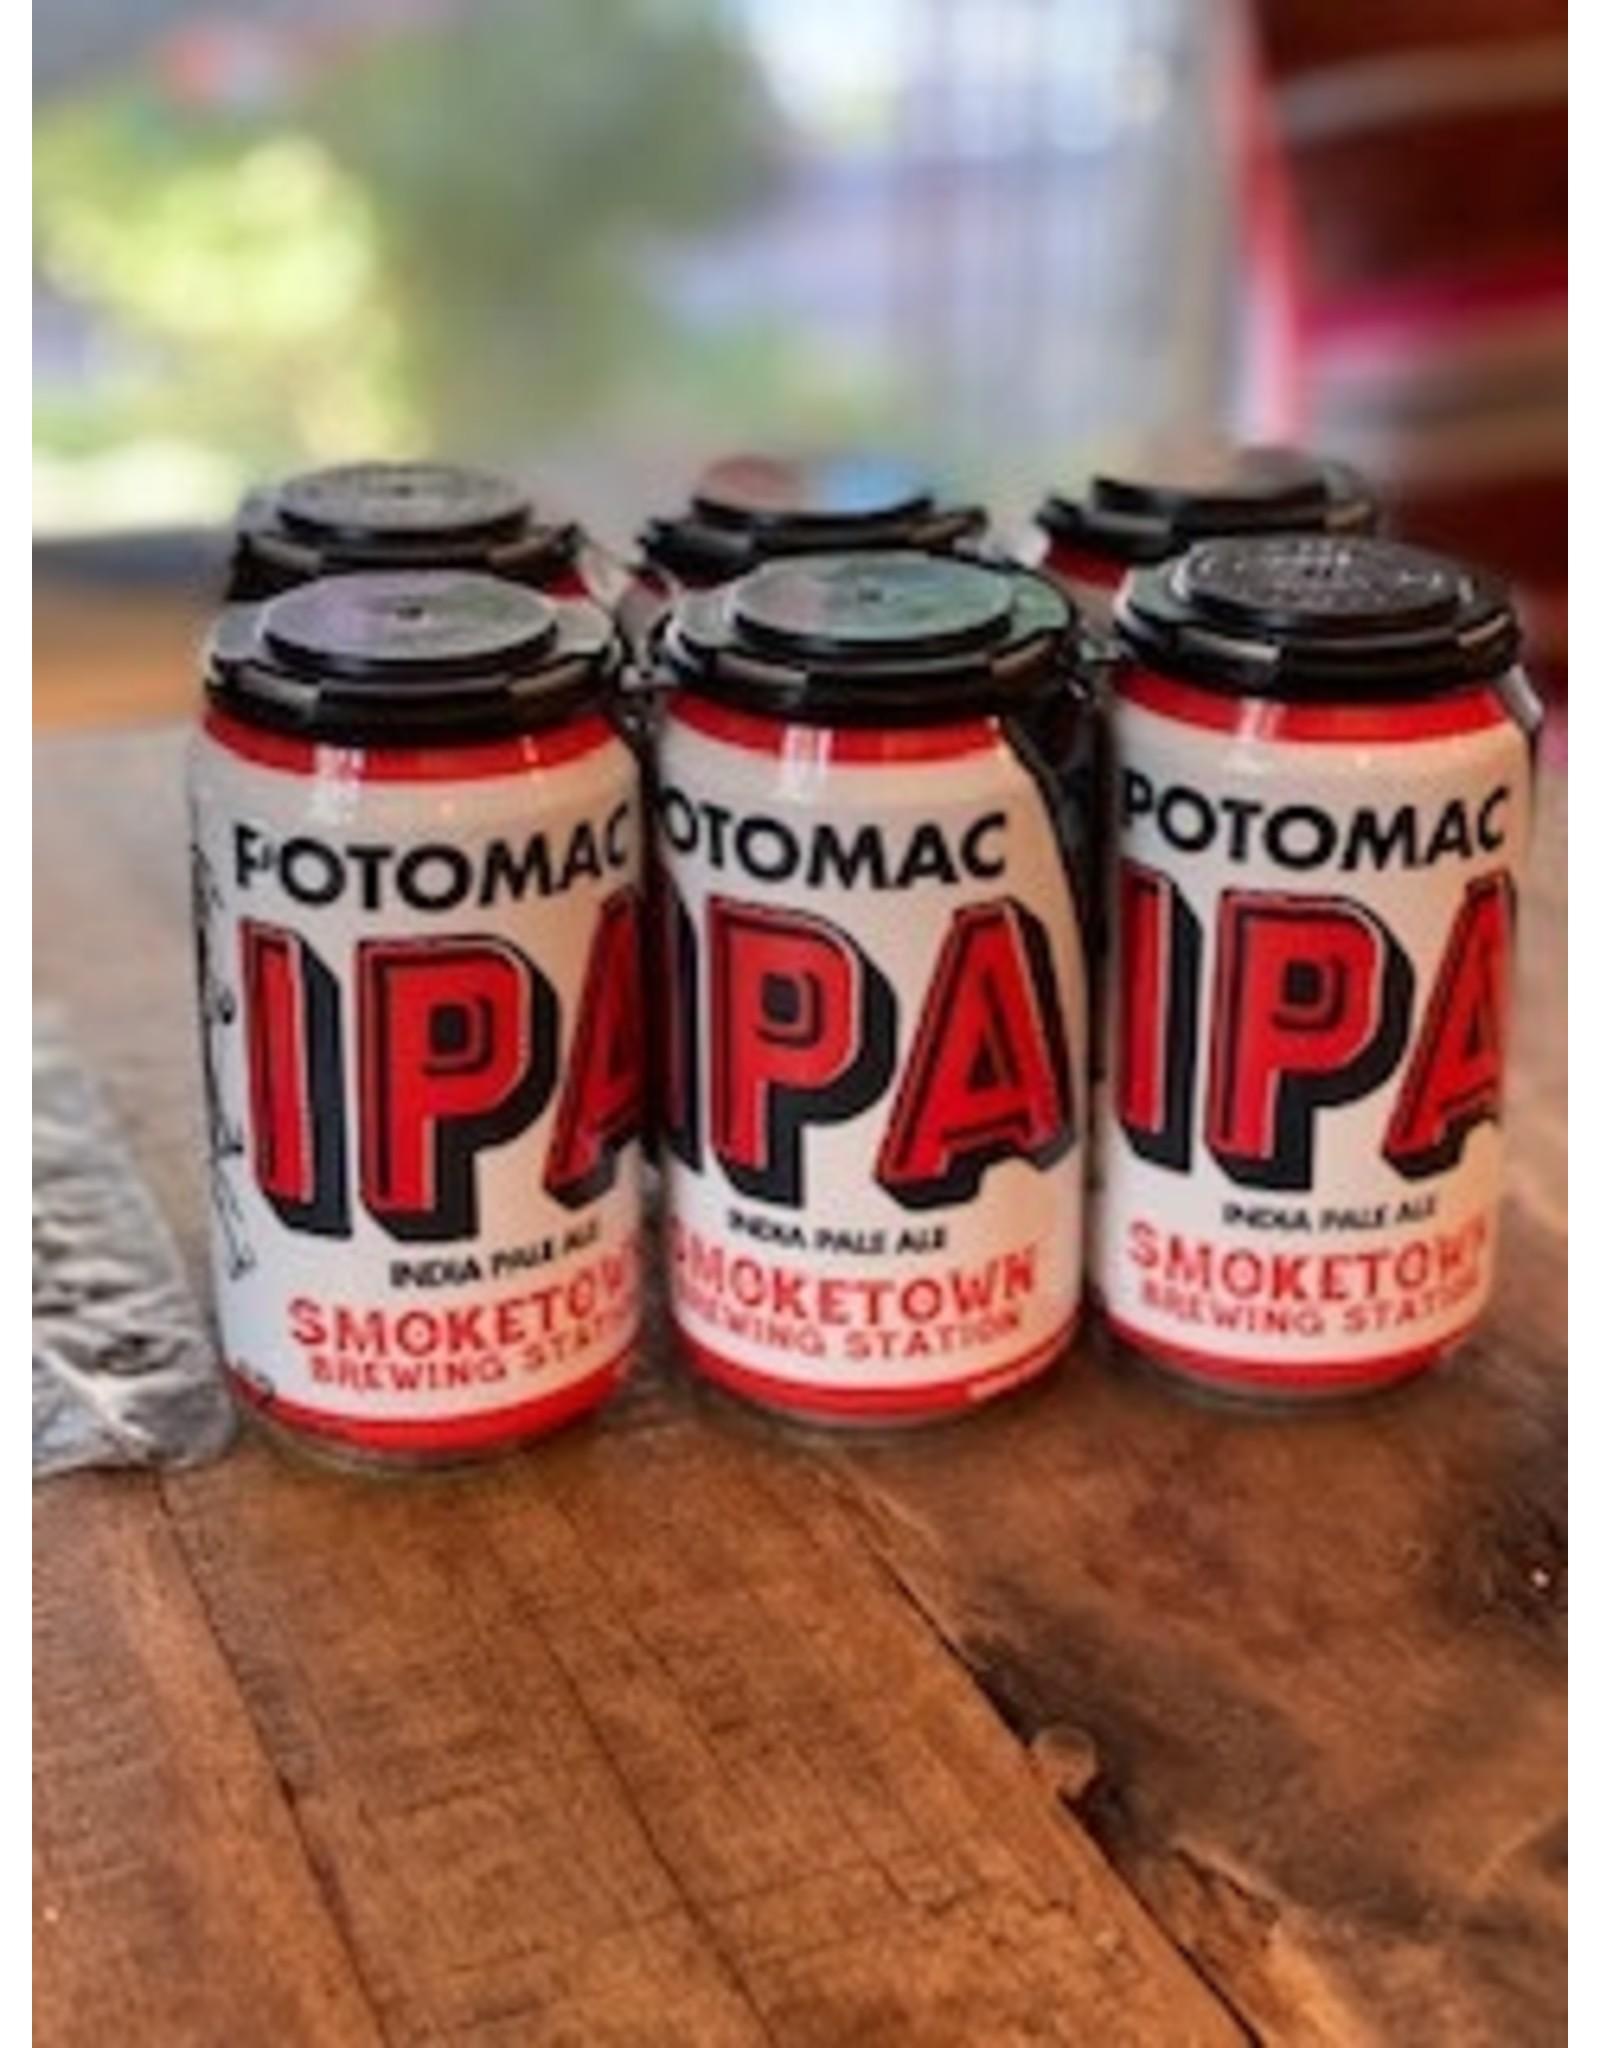 Potomac IPA, Six Pack